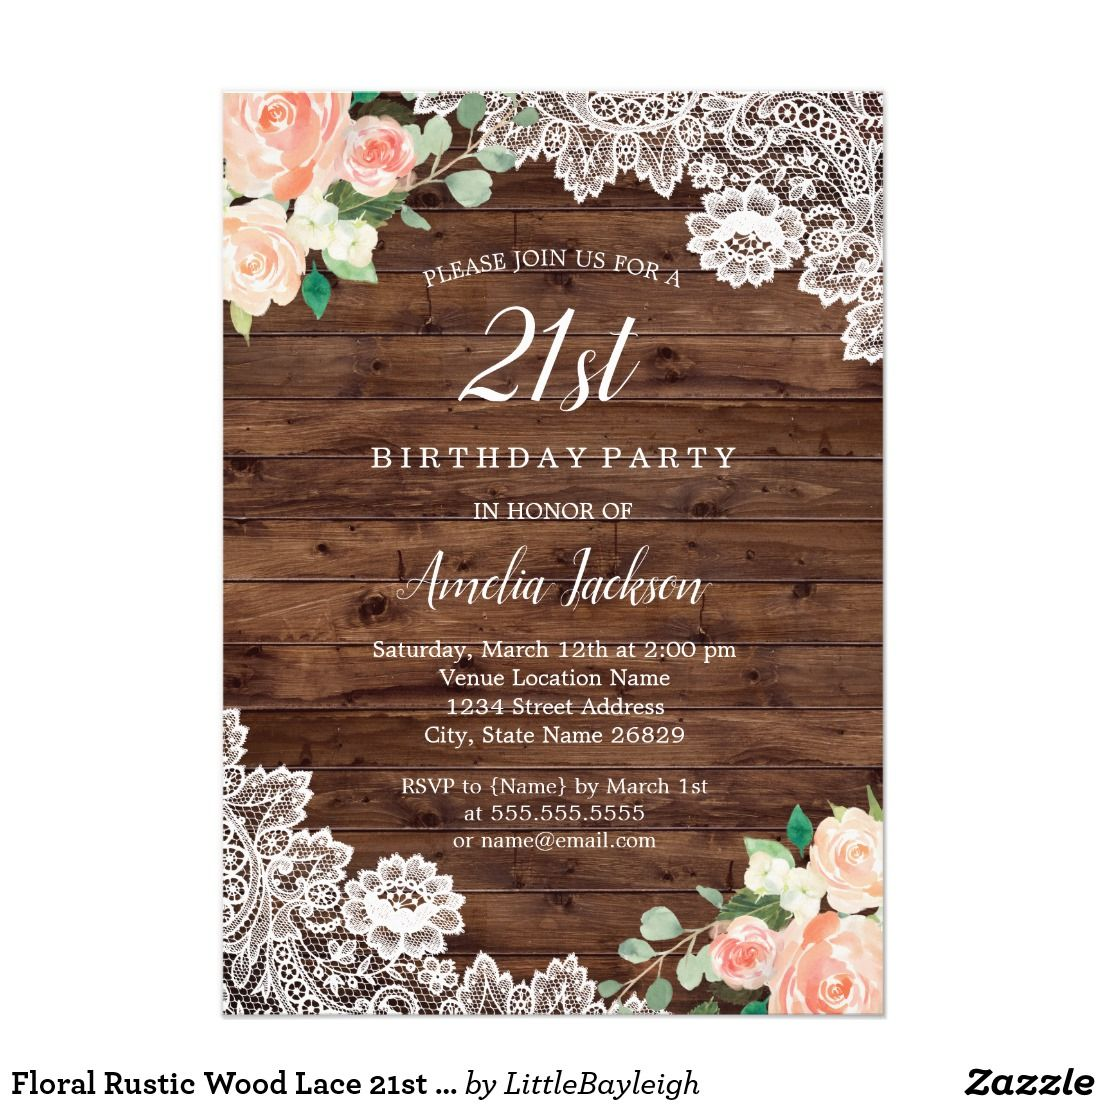 Floral Rustic Wood Lace 21st Birthday Invitation   21st birthday ...